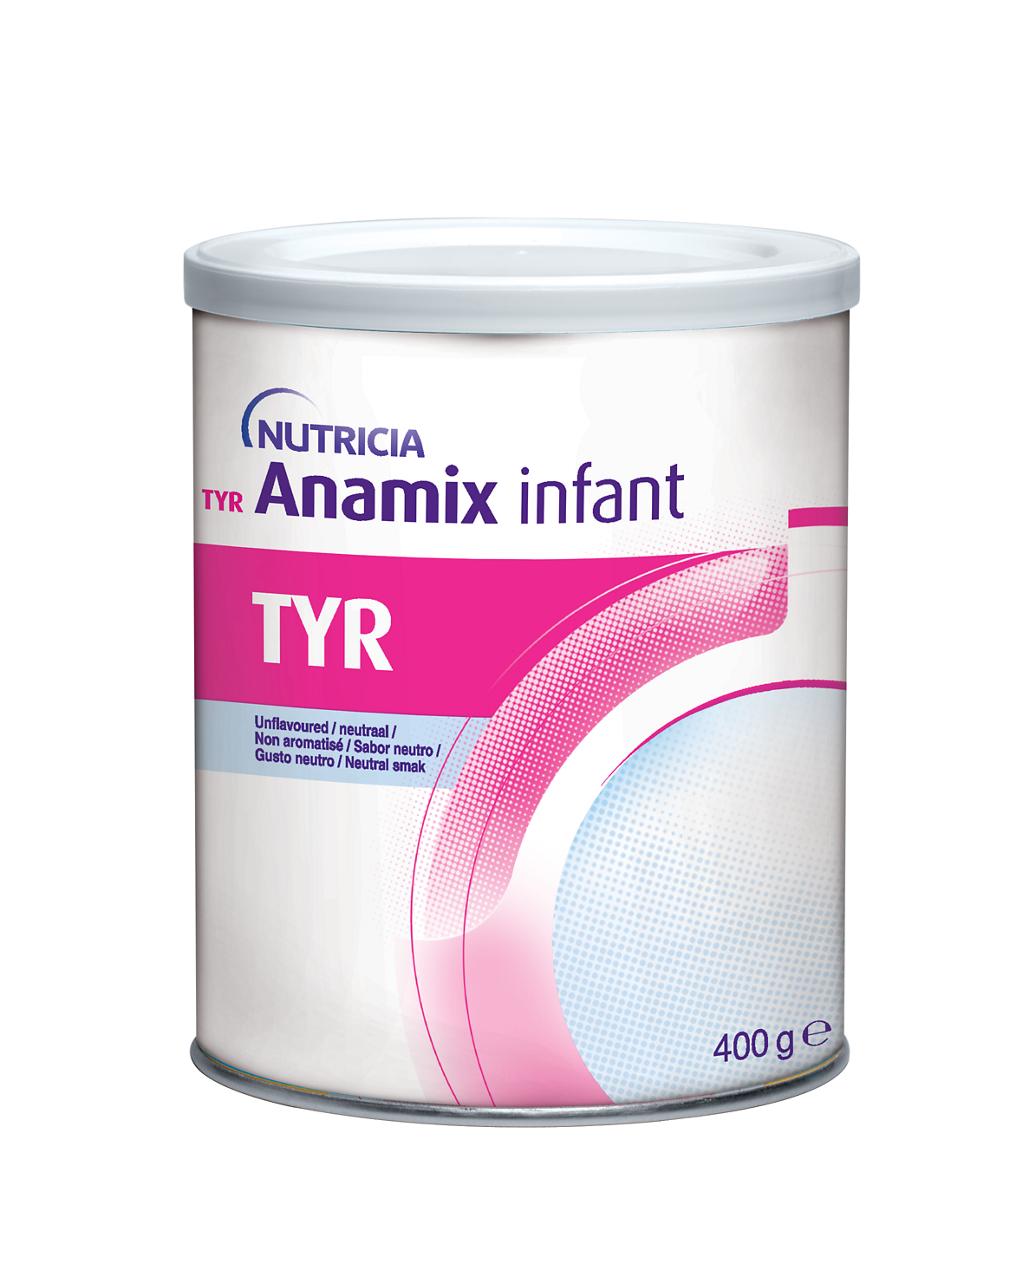 metabolics-tyr-anamix-infant-400g-tin-packshot.png